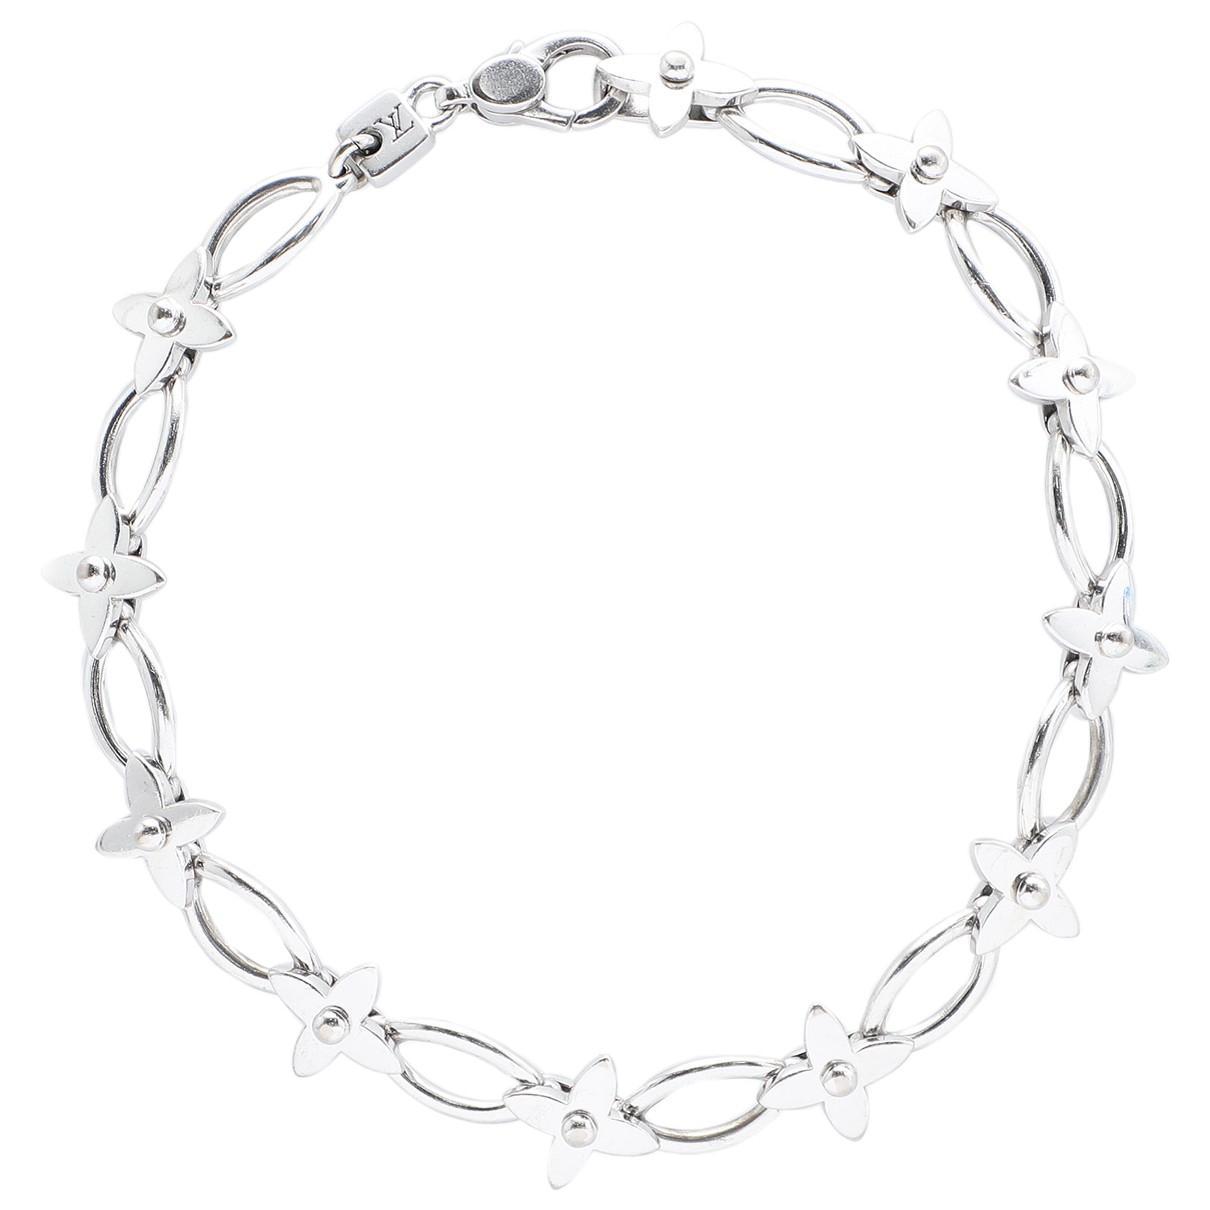 5bd1ef9aca08 Louis Vuitton Idylle Blossom White Gold Bracelet in Metallic - Lyst